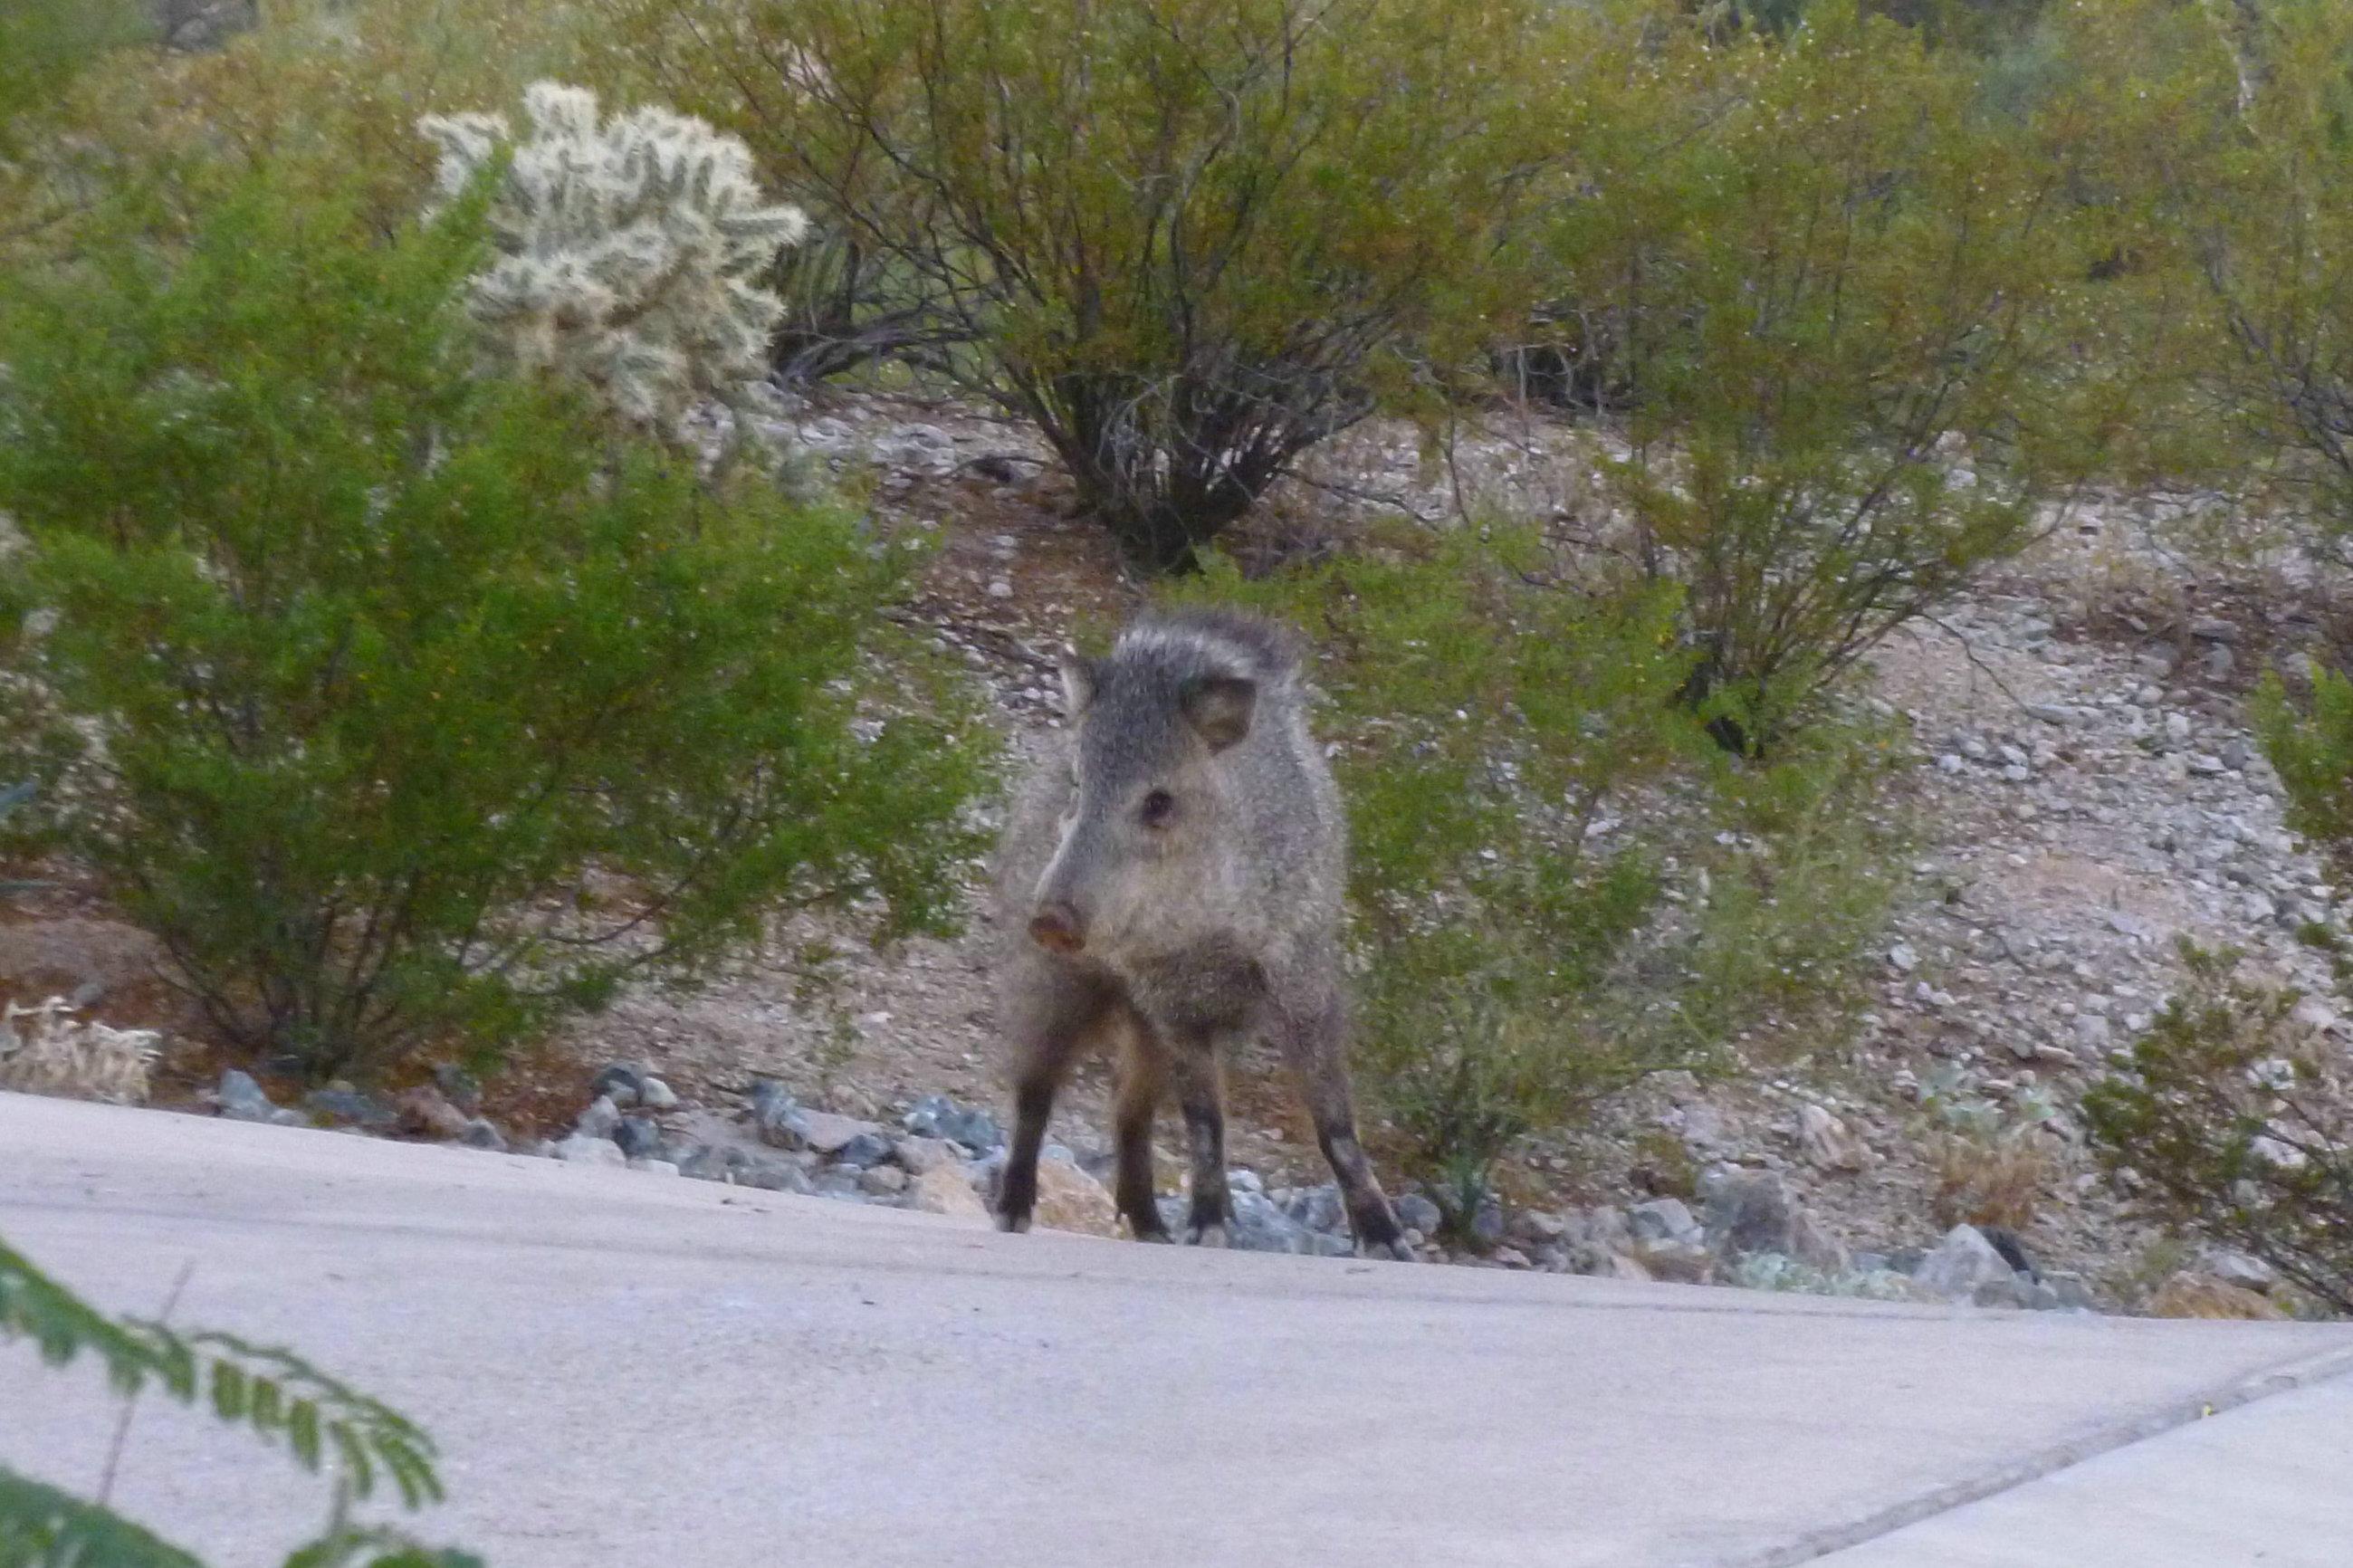 Arizona javelina collard peccary are pig like desert dwellers